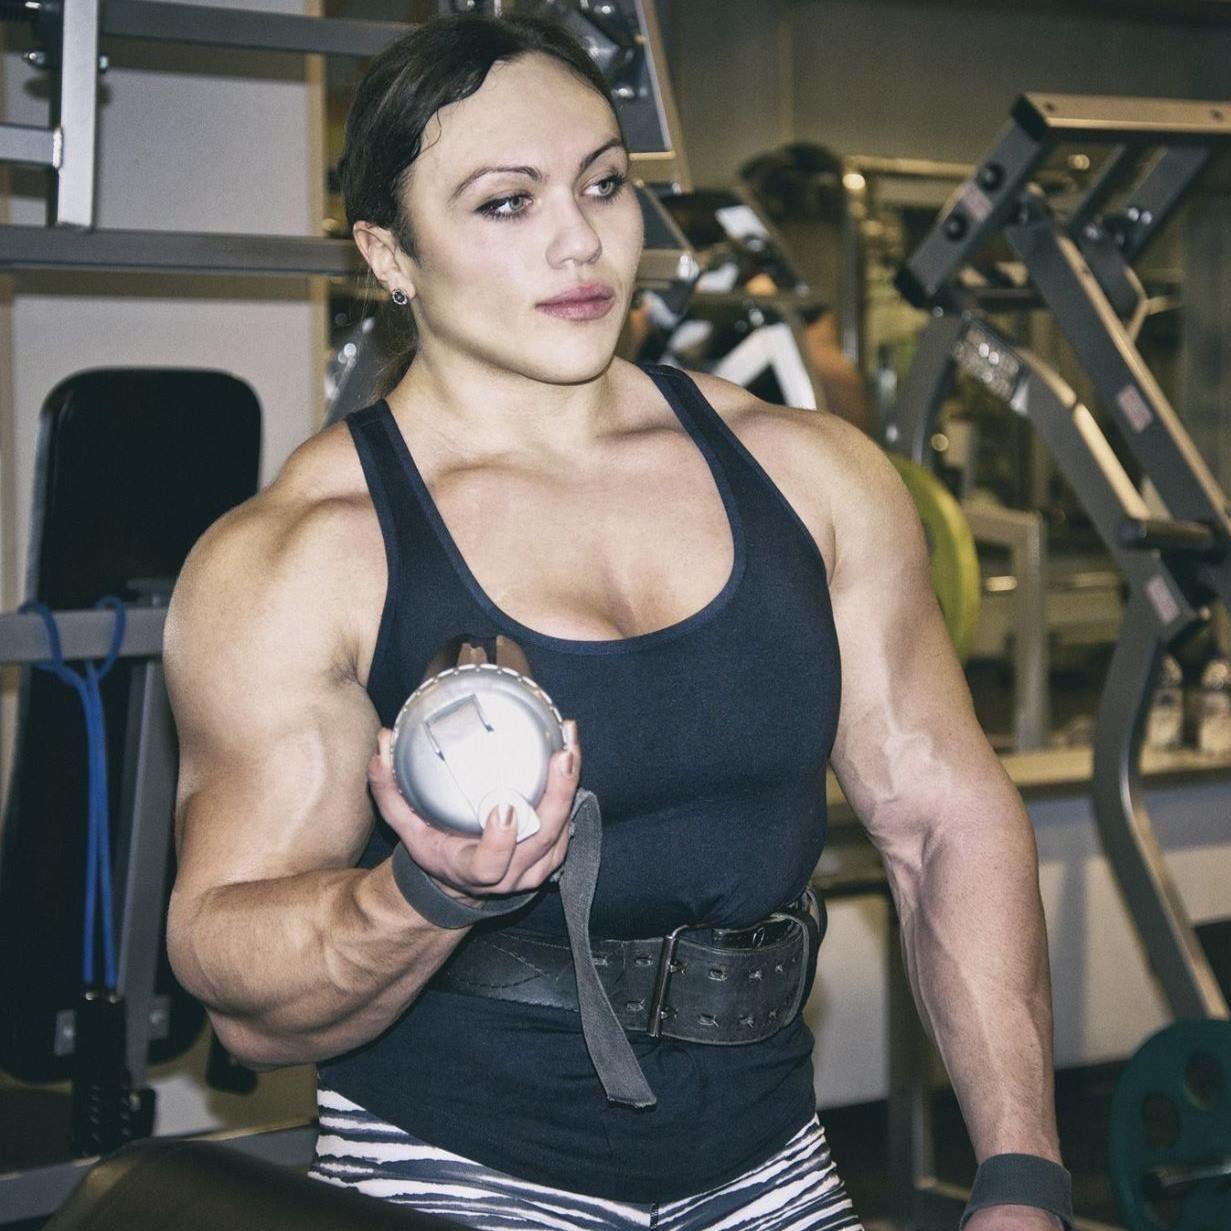 【過激画像】ロシア人女性23歳の画像wwwwwwwwwwwwwwww